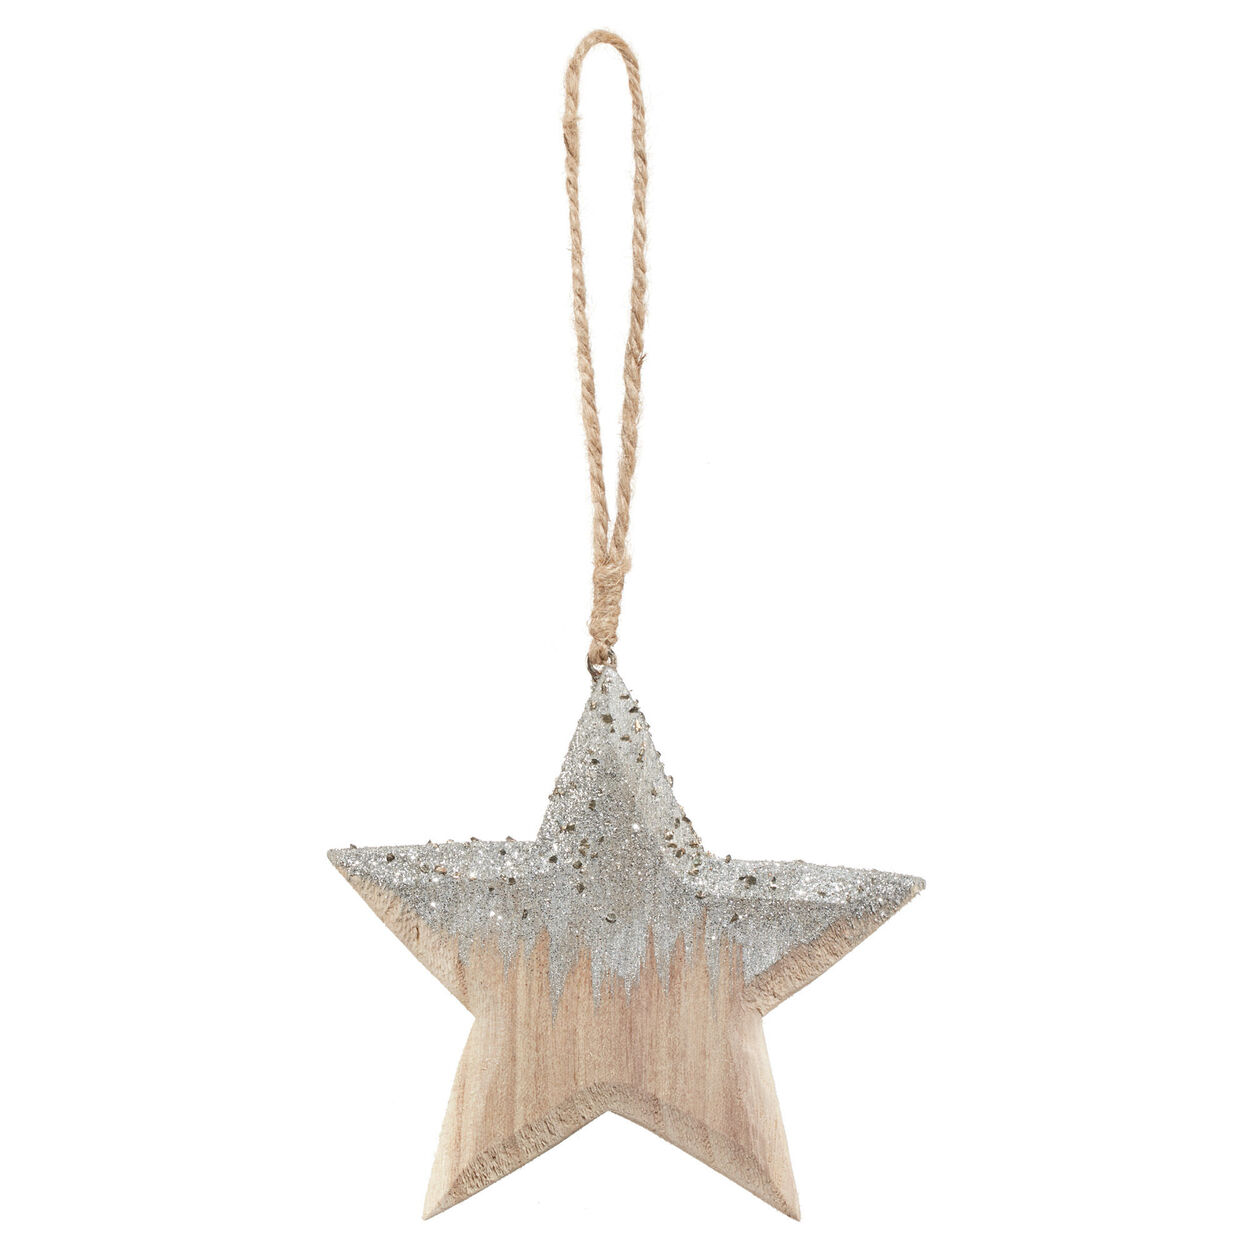 Wooden Star Ornament